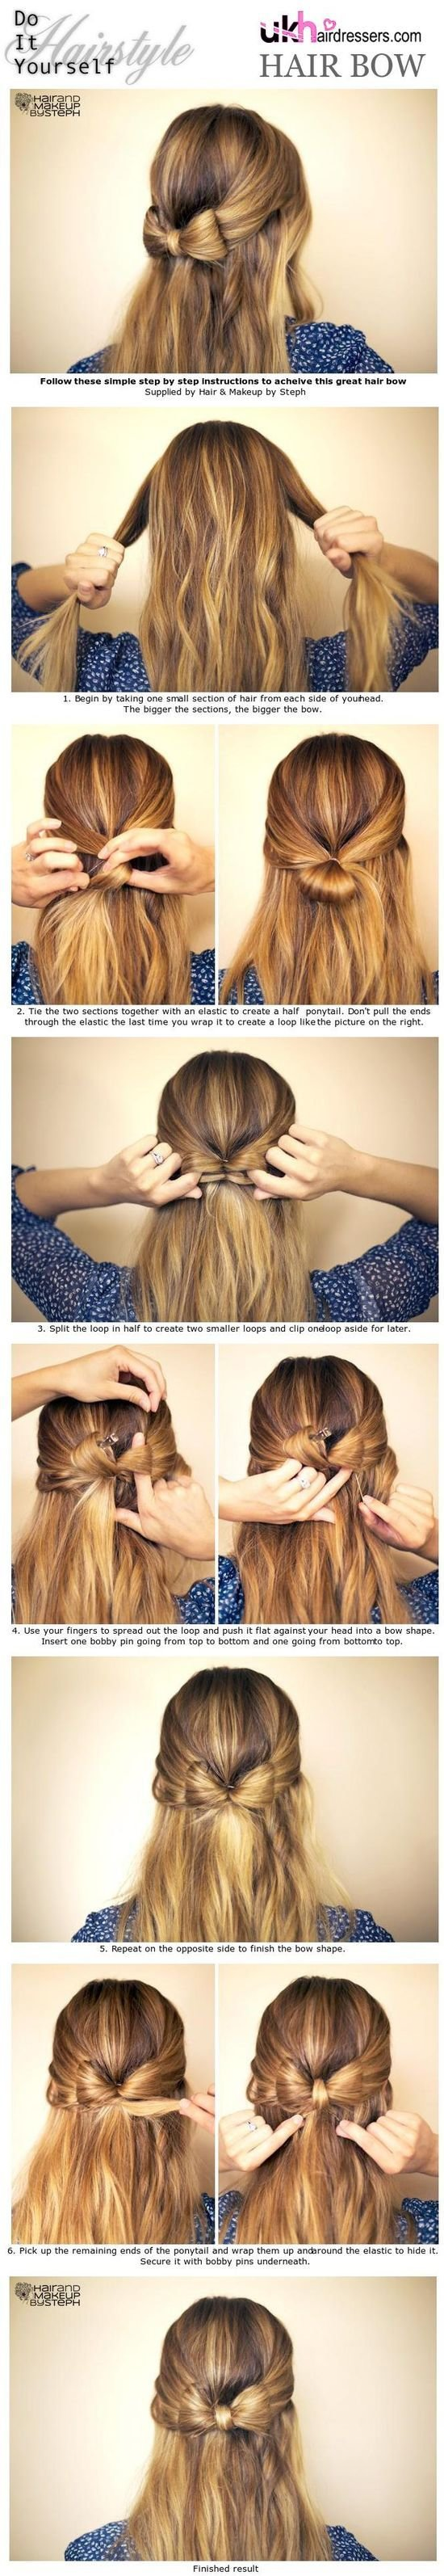 hairstyle,fur,wood,textile,flooring,